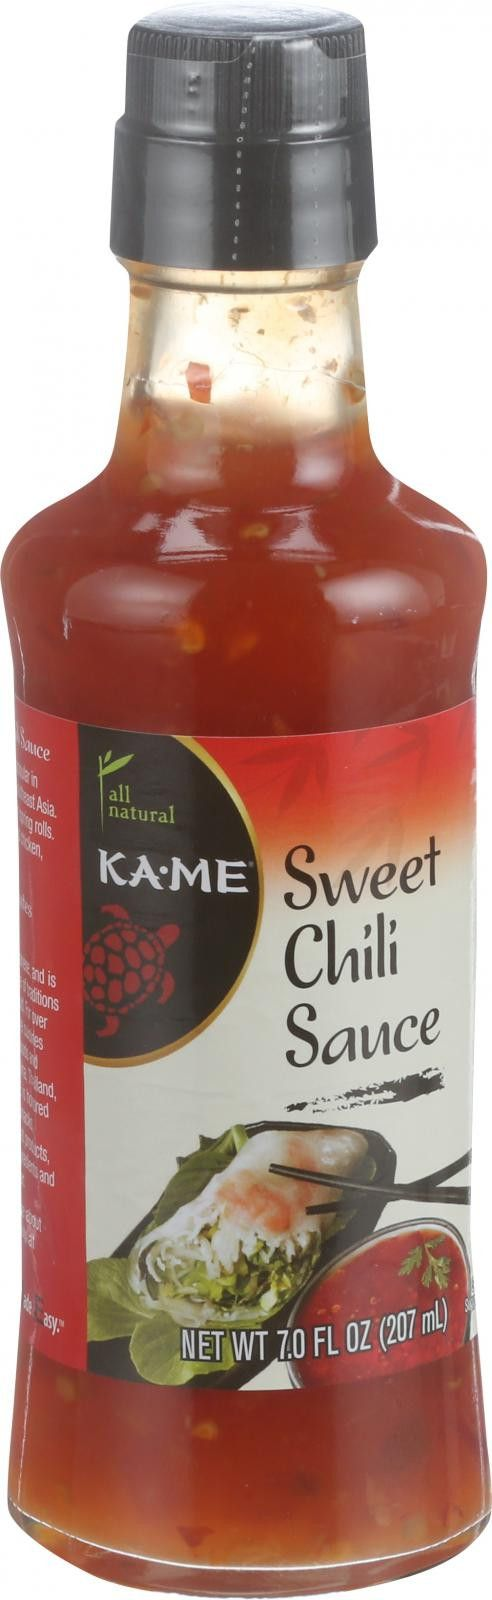 Ka'Me Thai Sweet Chili Sauce - 7 oz - Case of 6